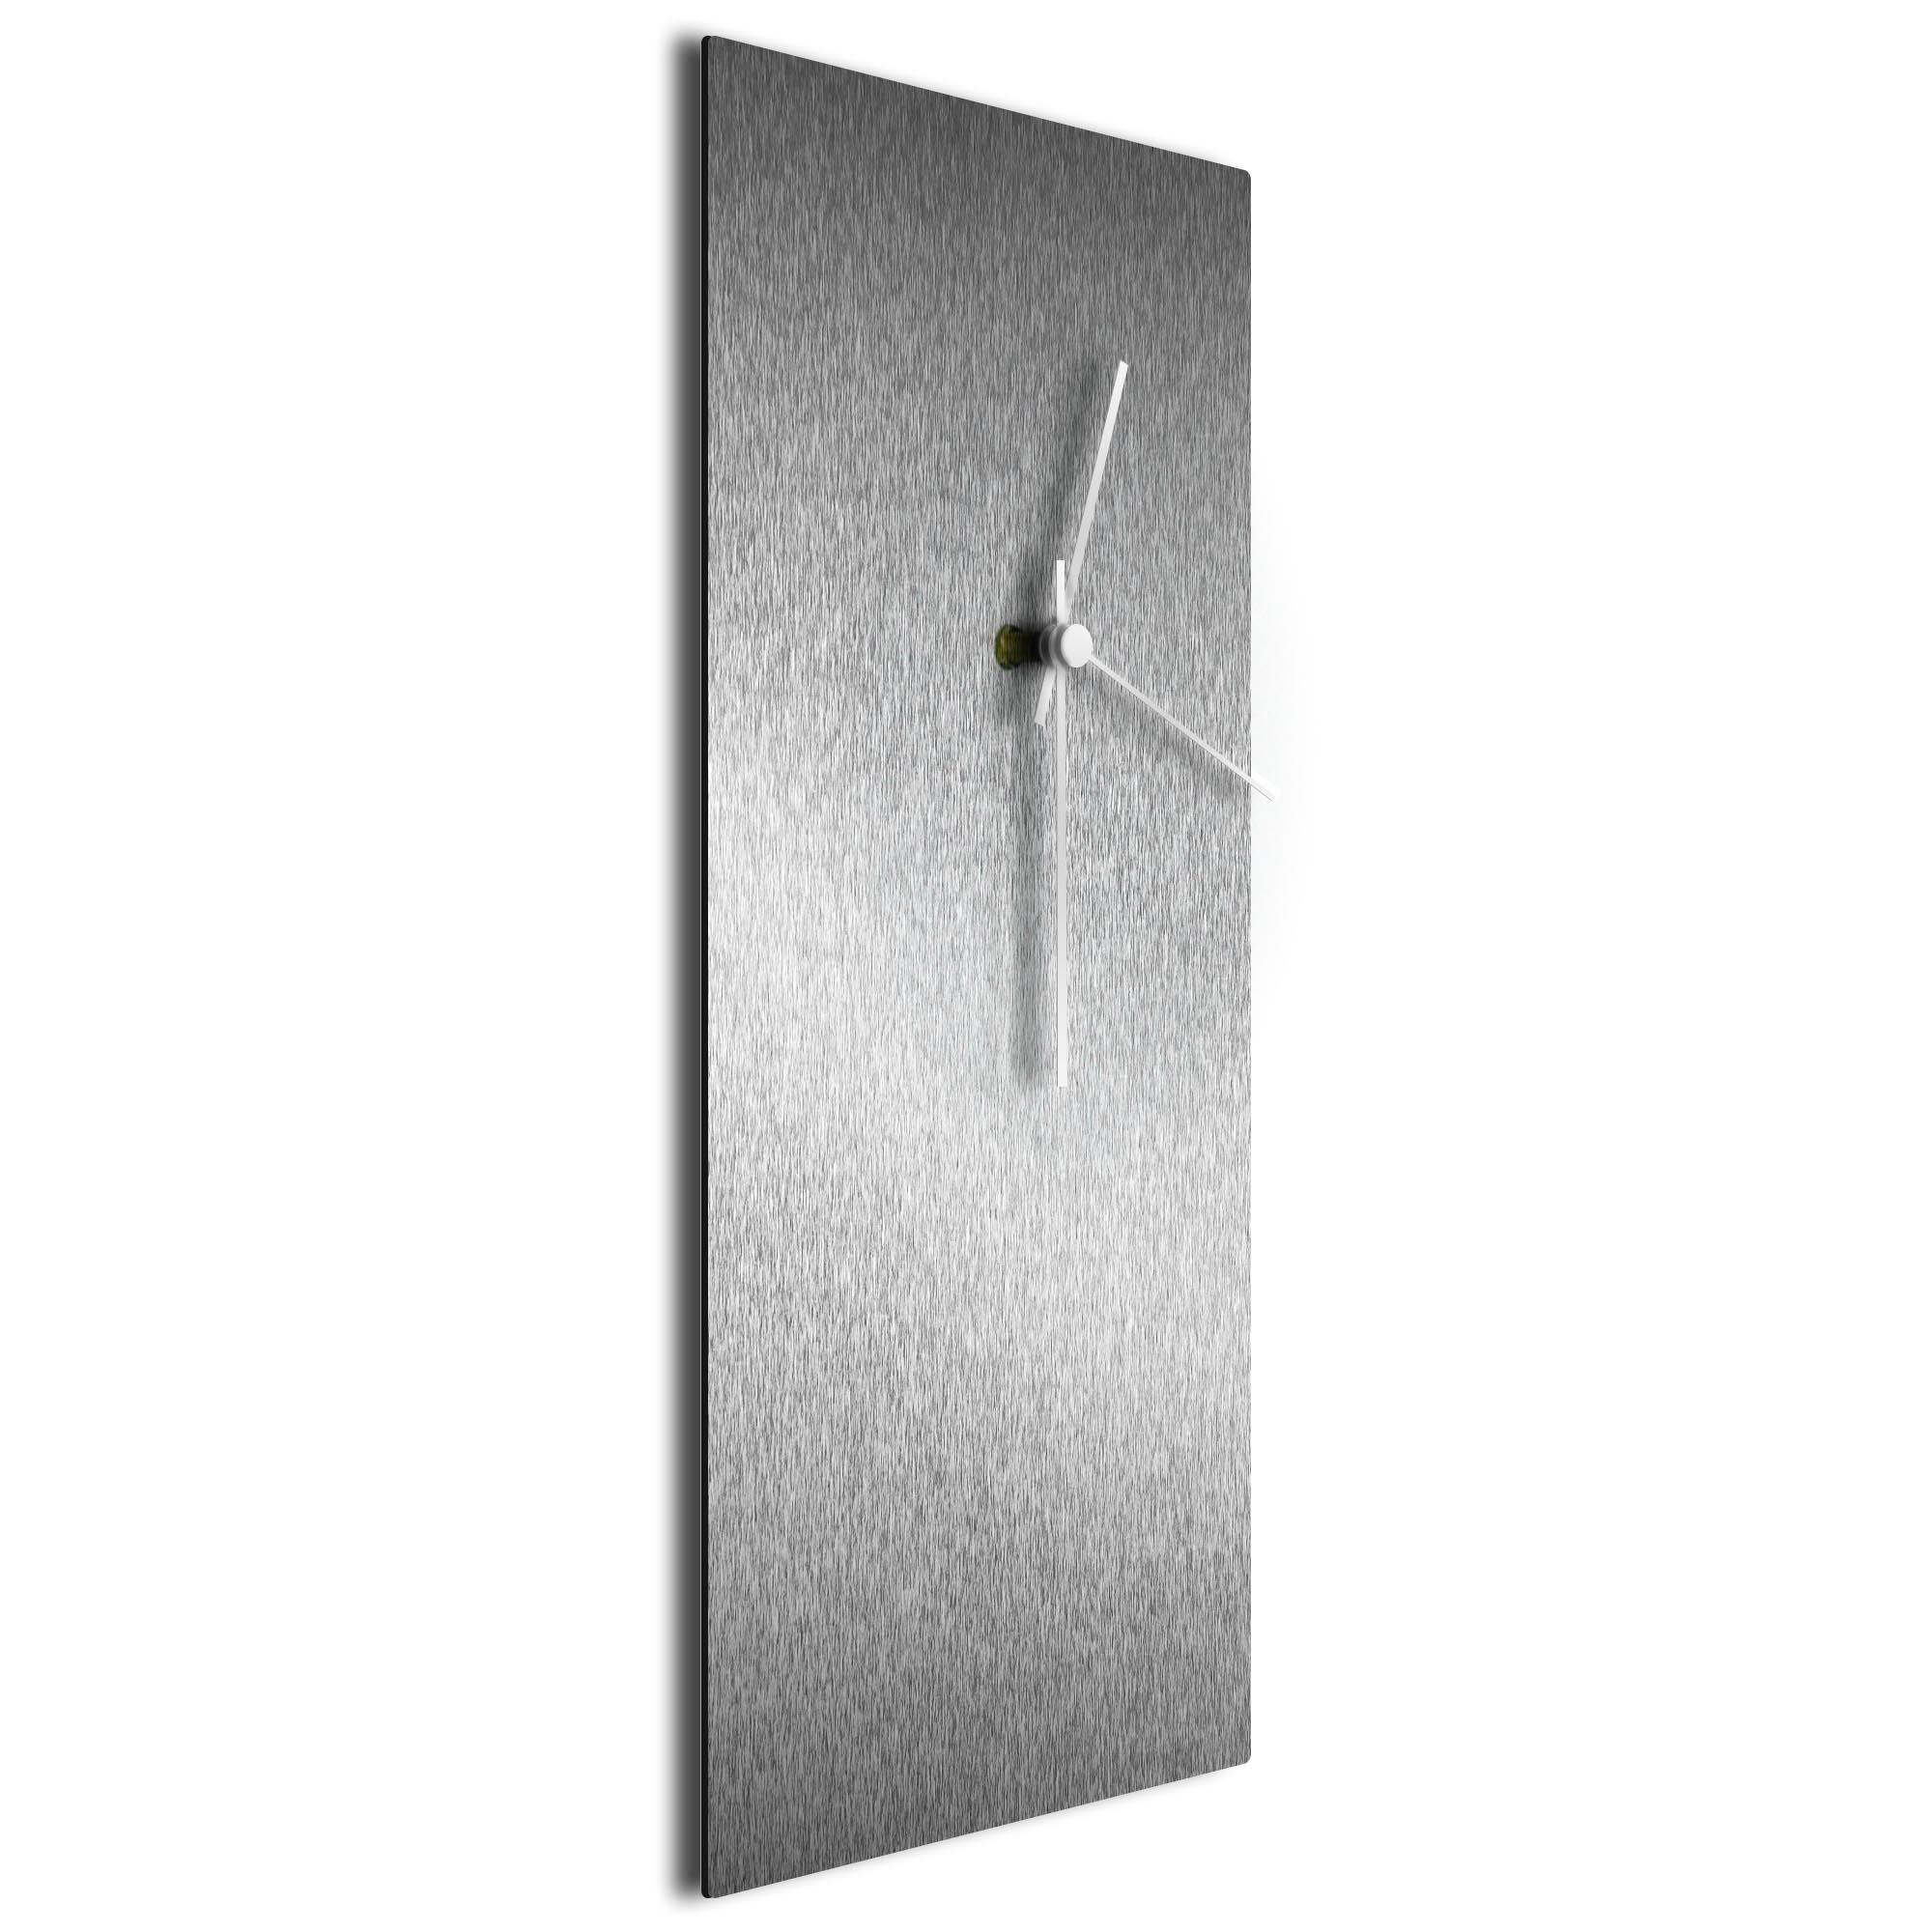 Silversmith Clock Large White - Image 2